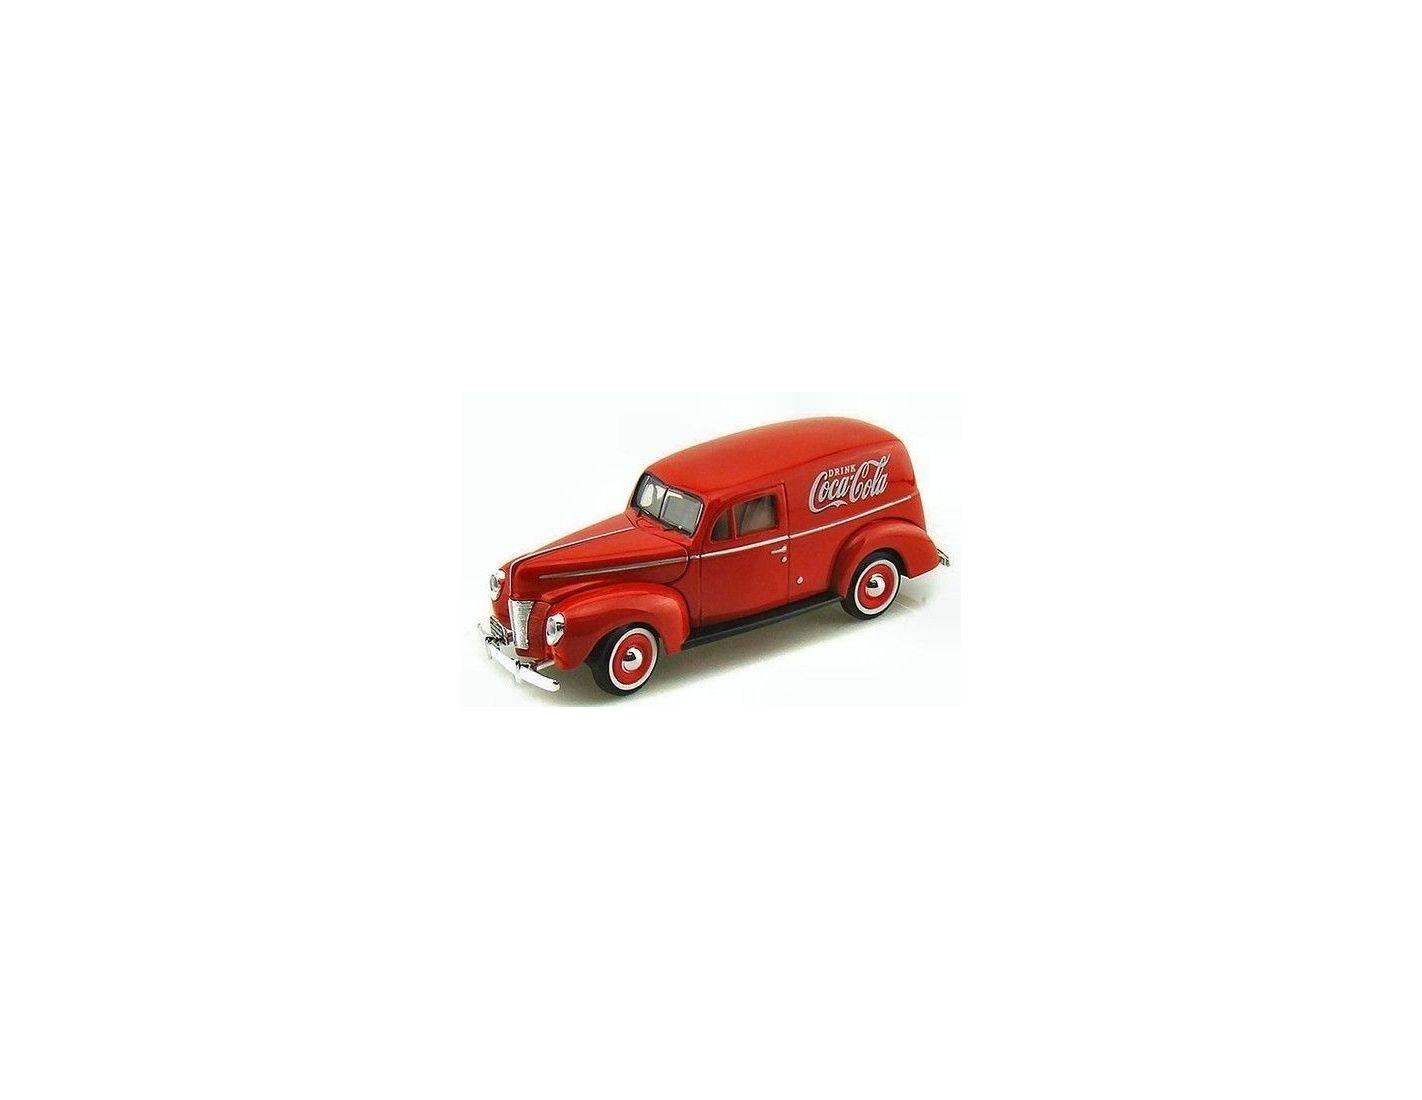 Motor City 365913 Ford Sedan Delivery 1940 1 24 Modellino